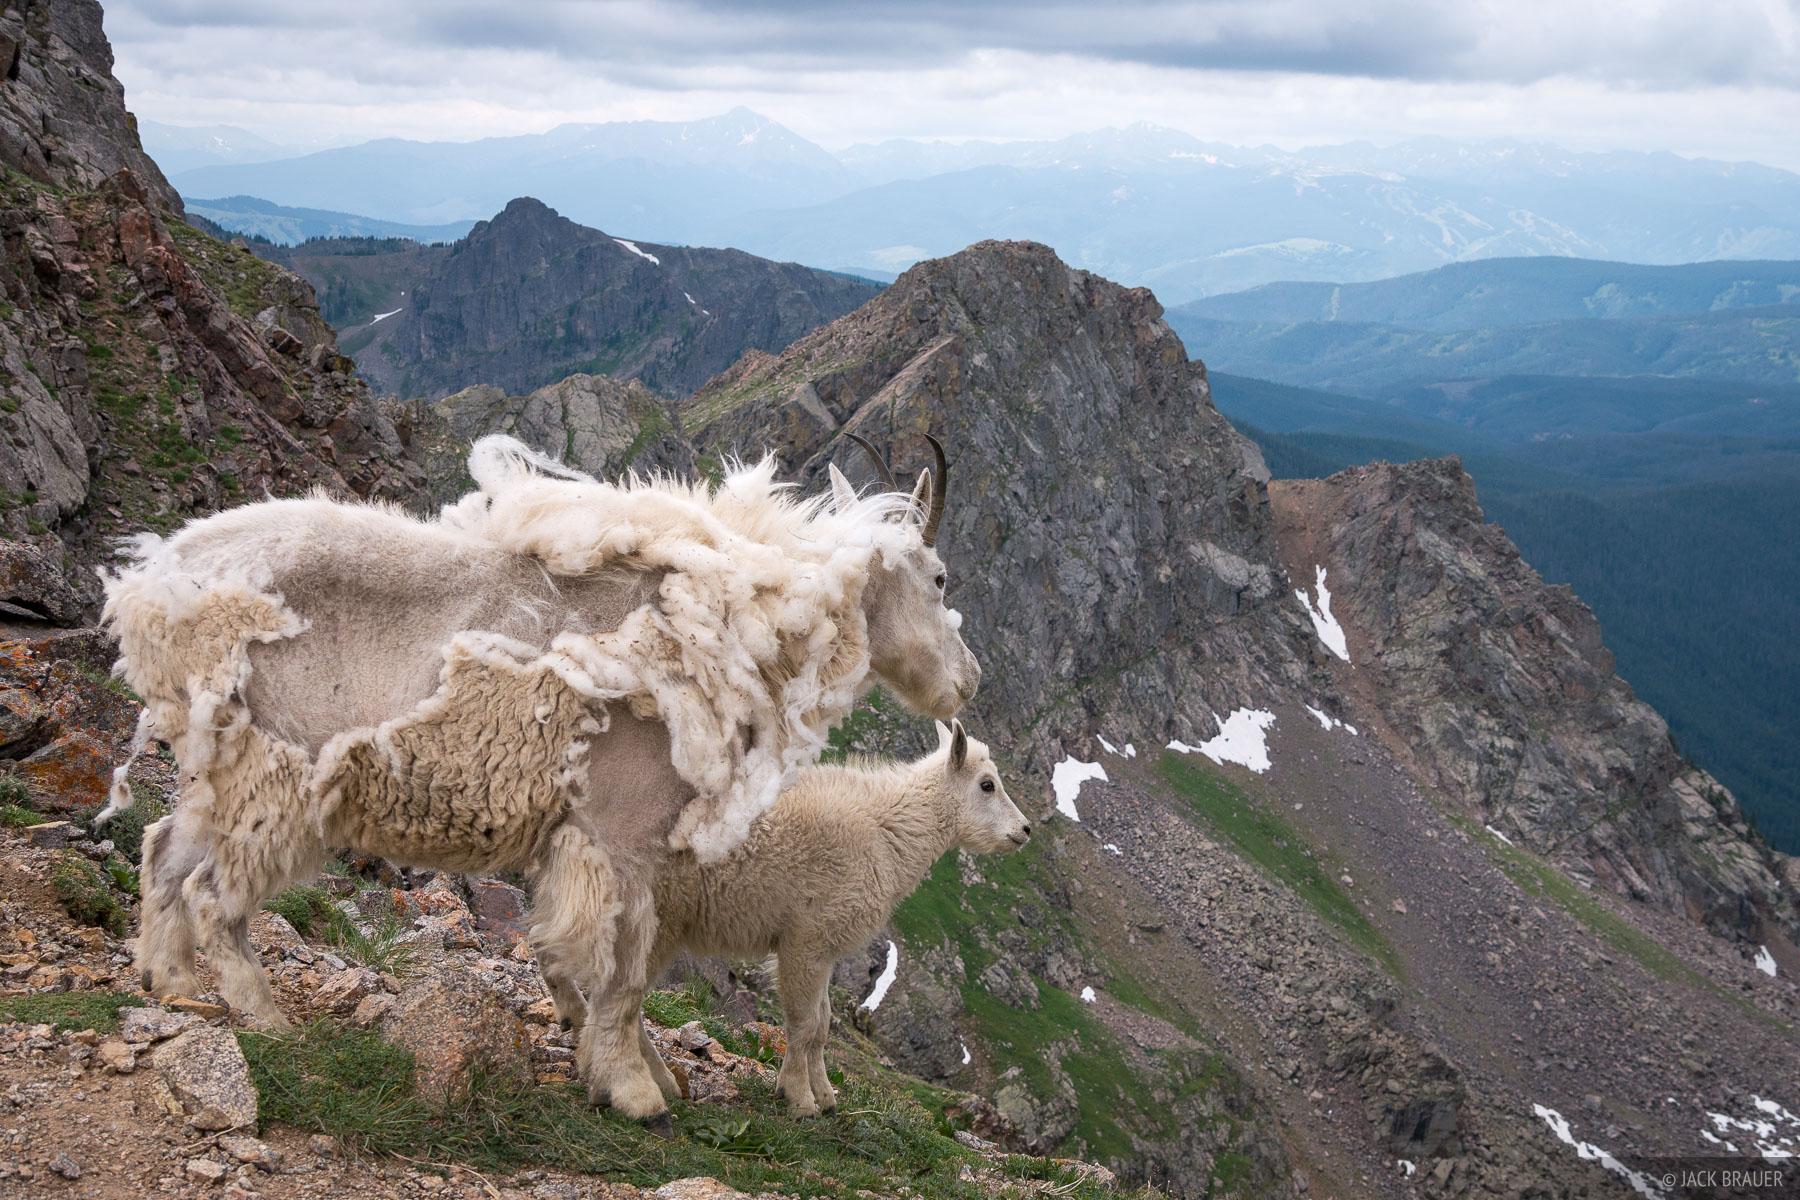 Colorado, Gore Range, mountain goat, Eagles Nest Wilderness, Kneeknocker Pass, Vail, photo